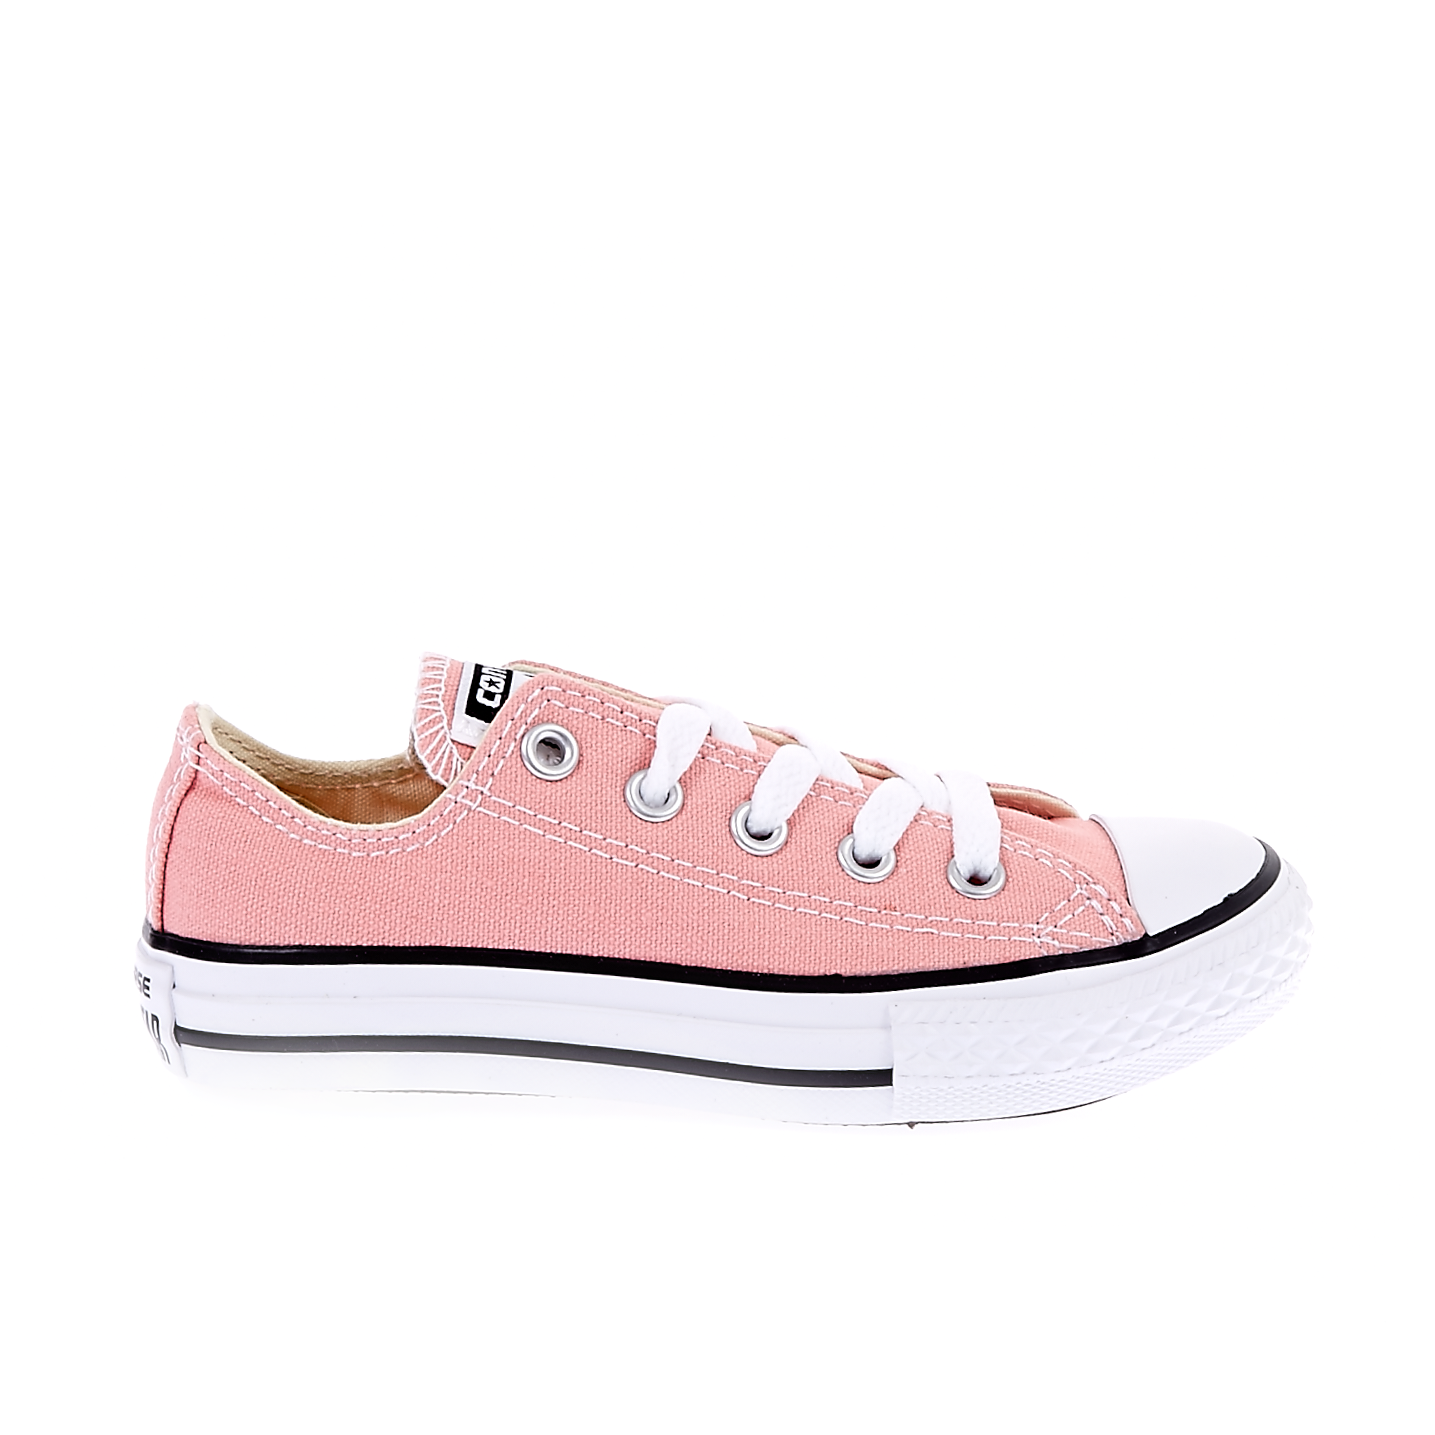 eda593a0579 CONVERSE – Παιδικά παπούτσια Chuck Taylor All Star Ox ροζ